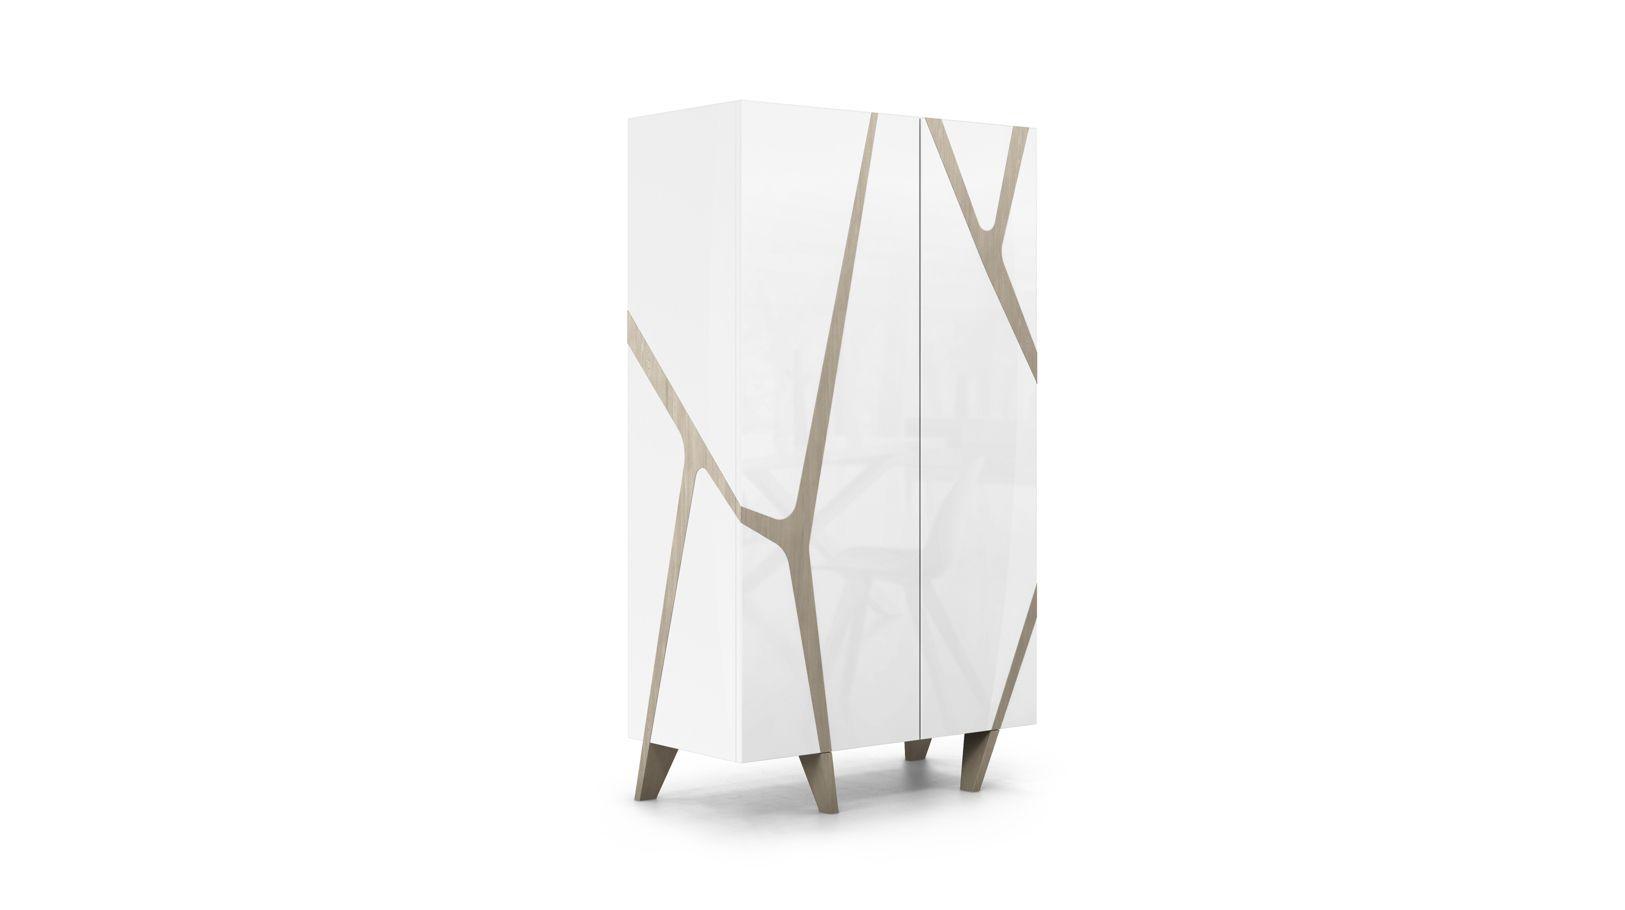 mangrove china unit roche bobois. Black Bedroom Furniture Sets. Home Design Ideas